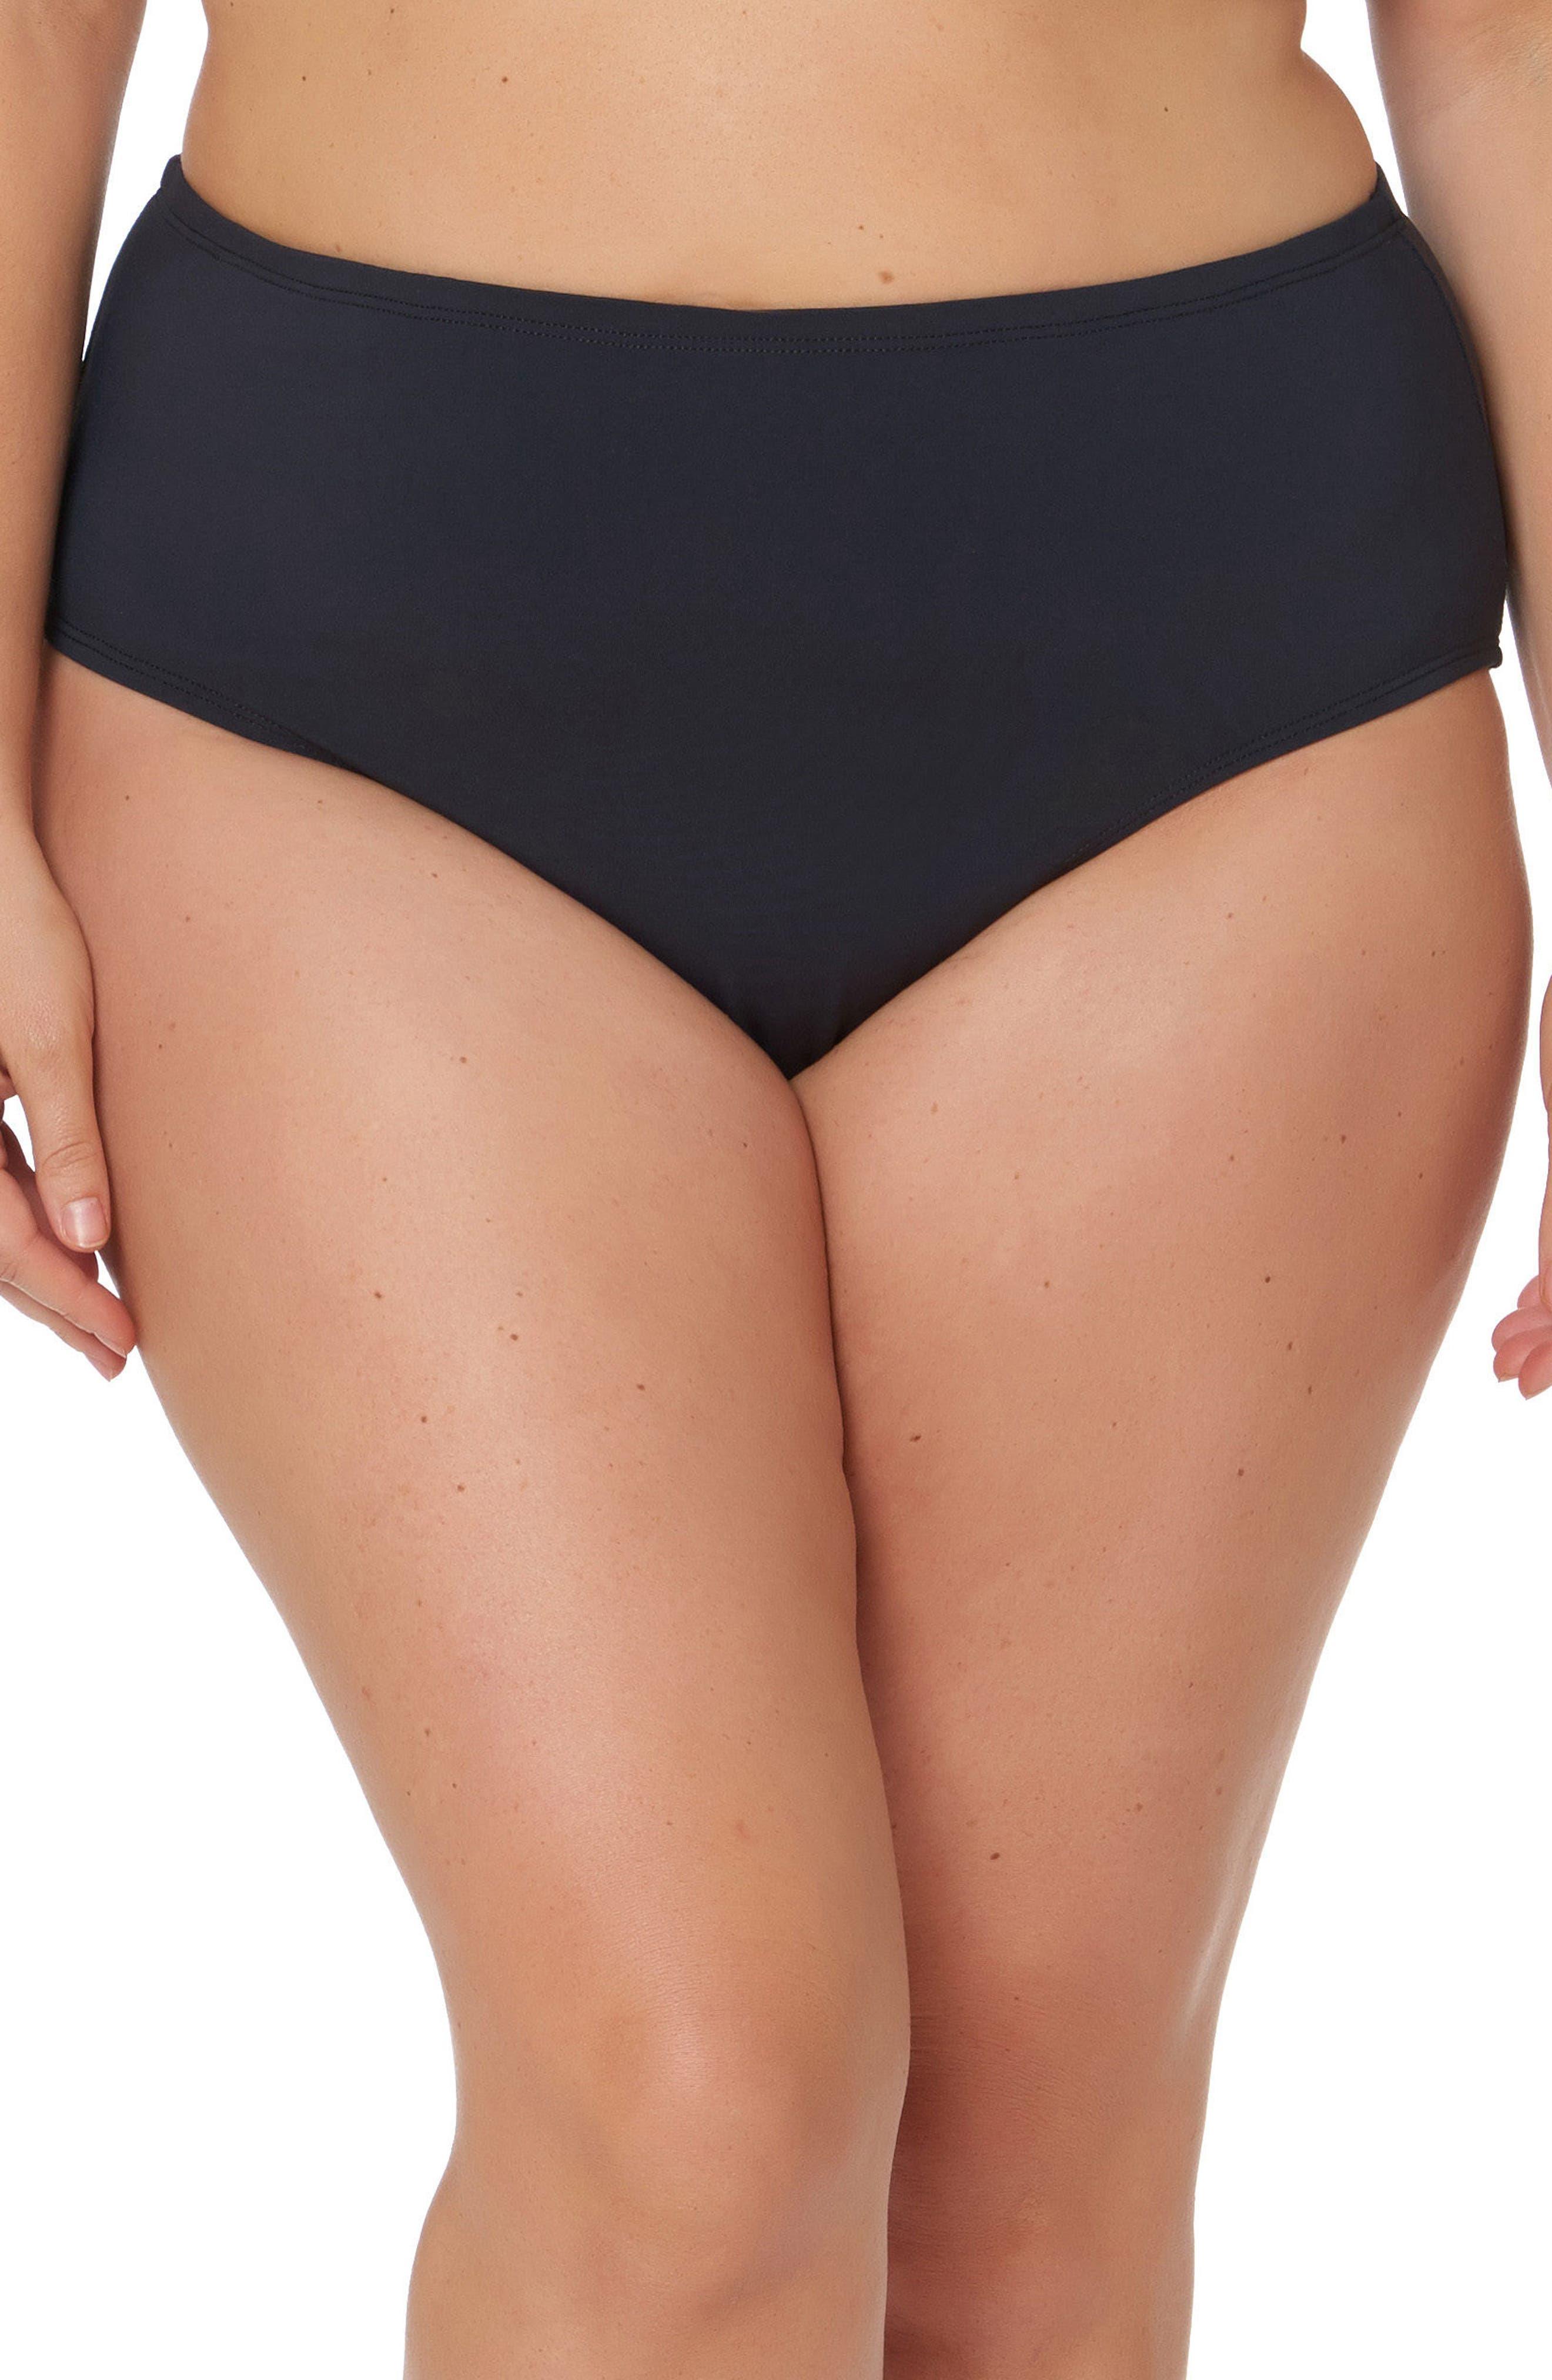 Alternate Image 1 Selected - BLEU by Rod Beattie High Waist Bikini Bottoms (Plus Size)